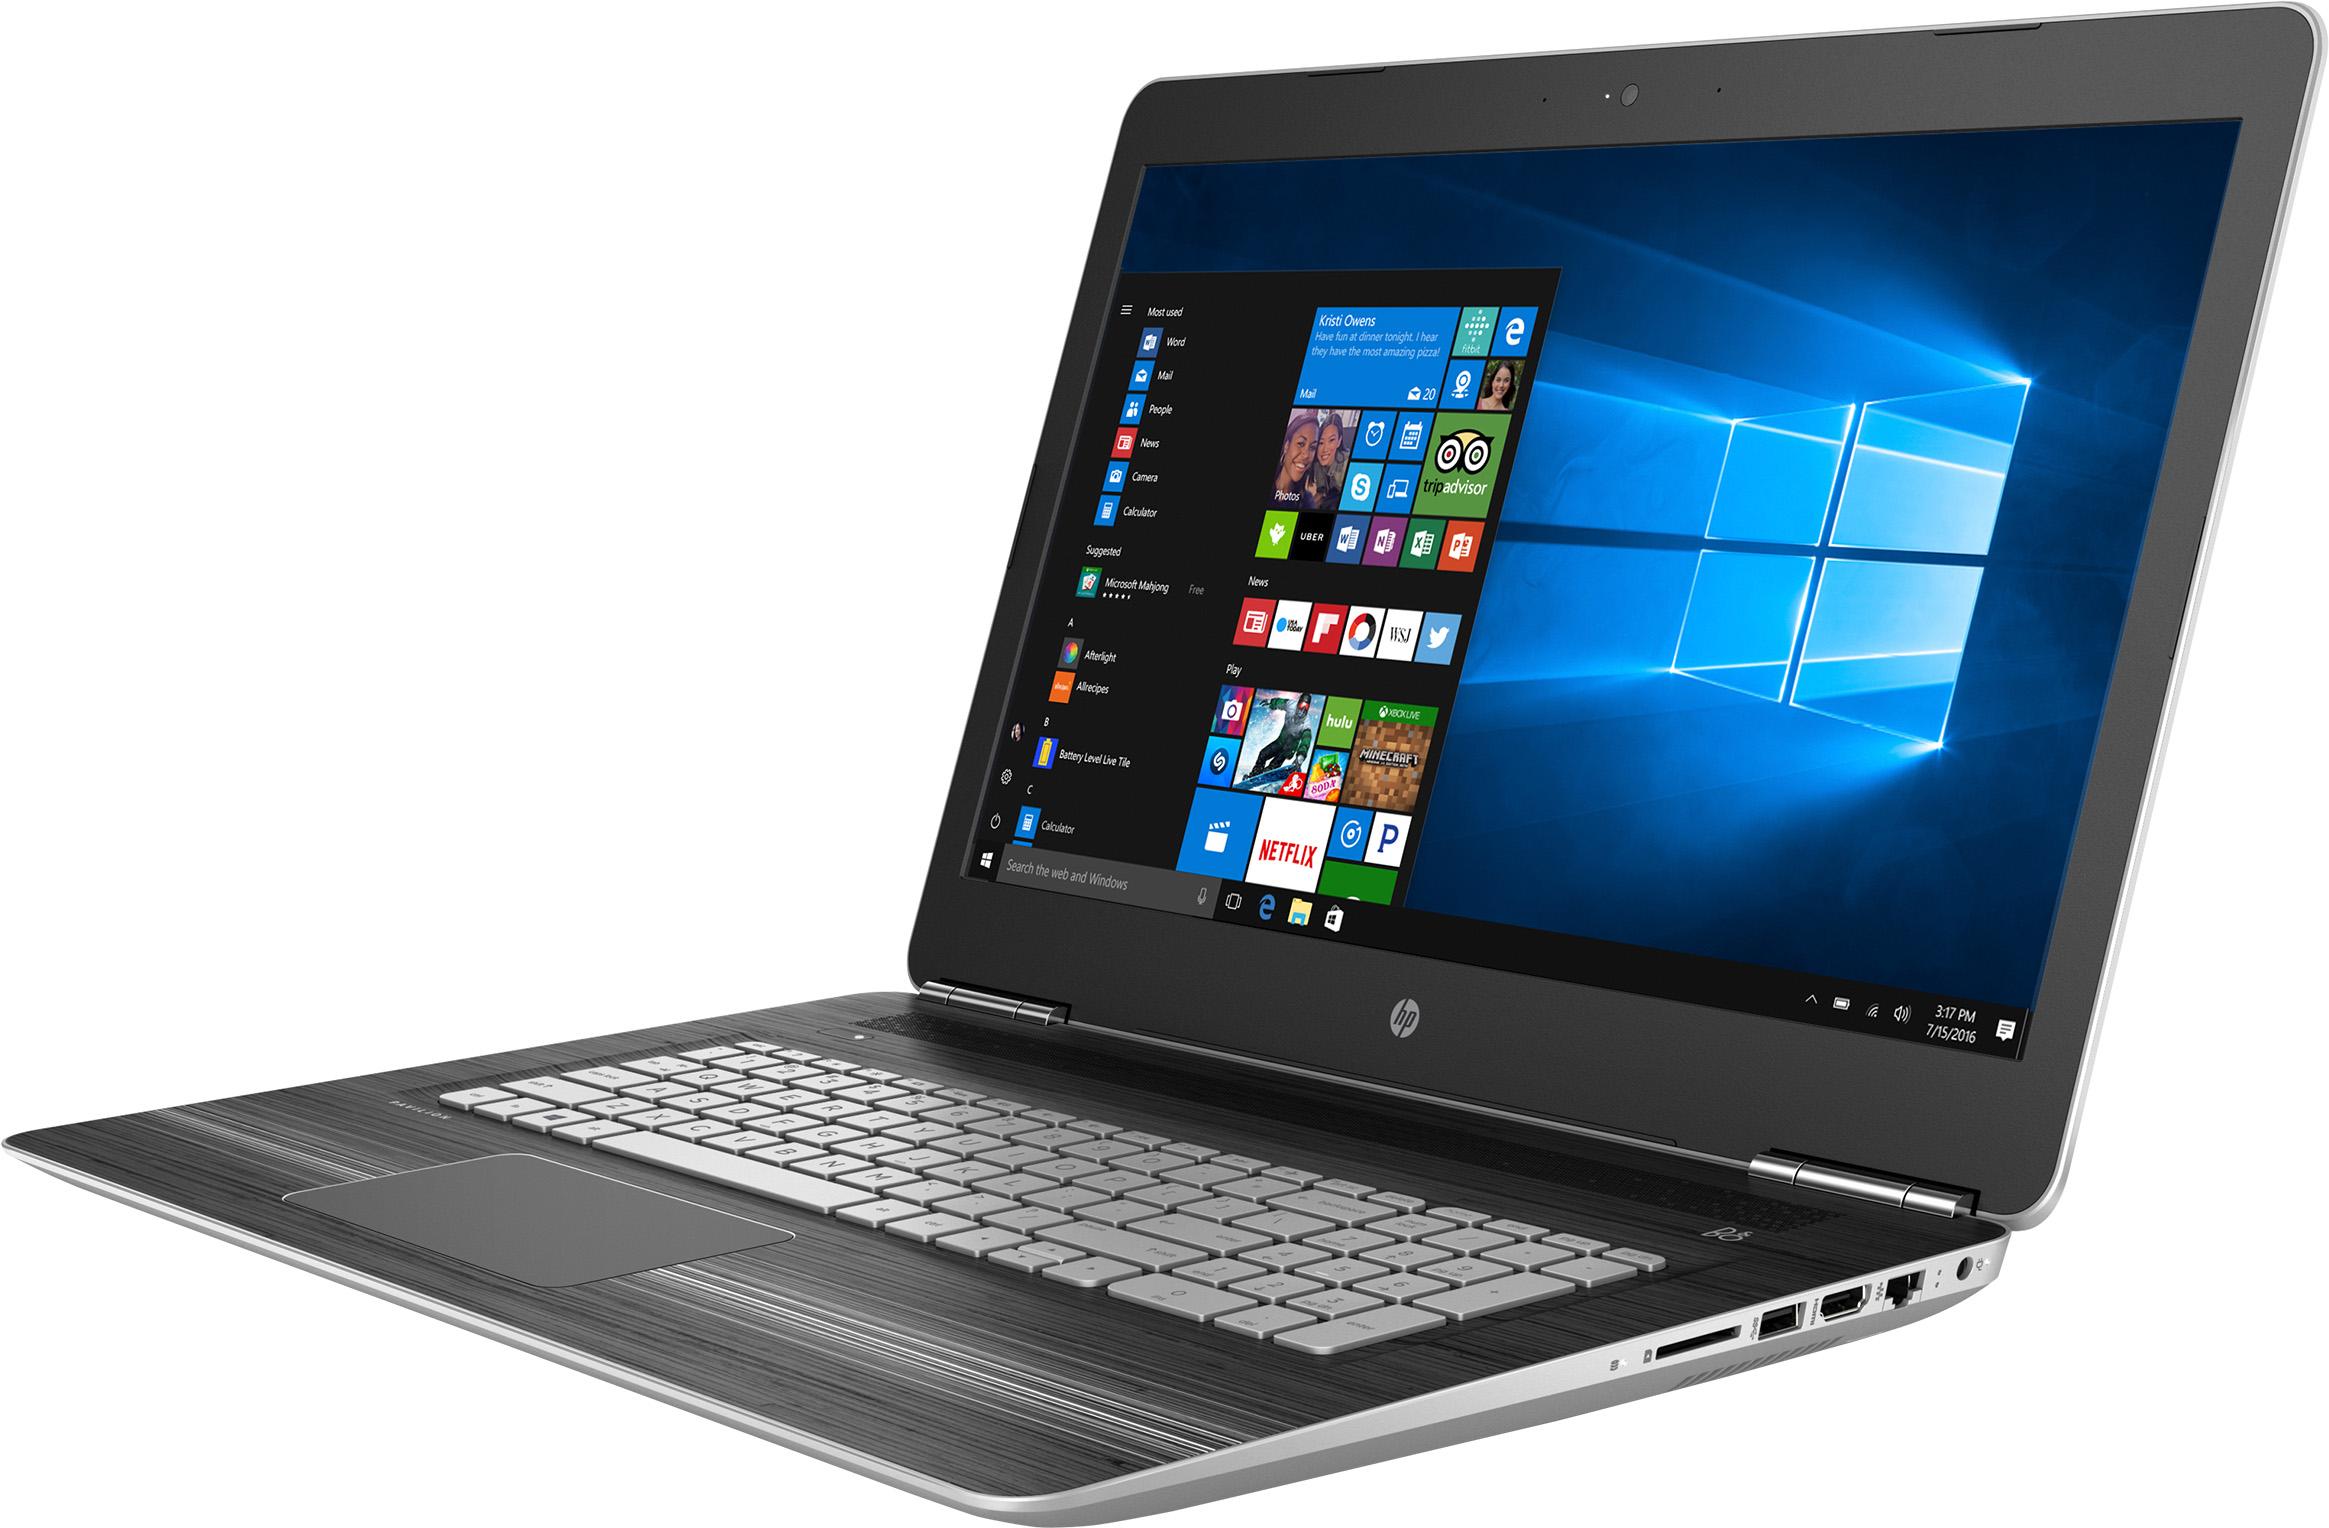 HP Pavilion Notebook 17-ab292ms Laptop